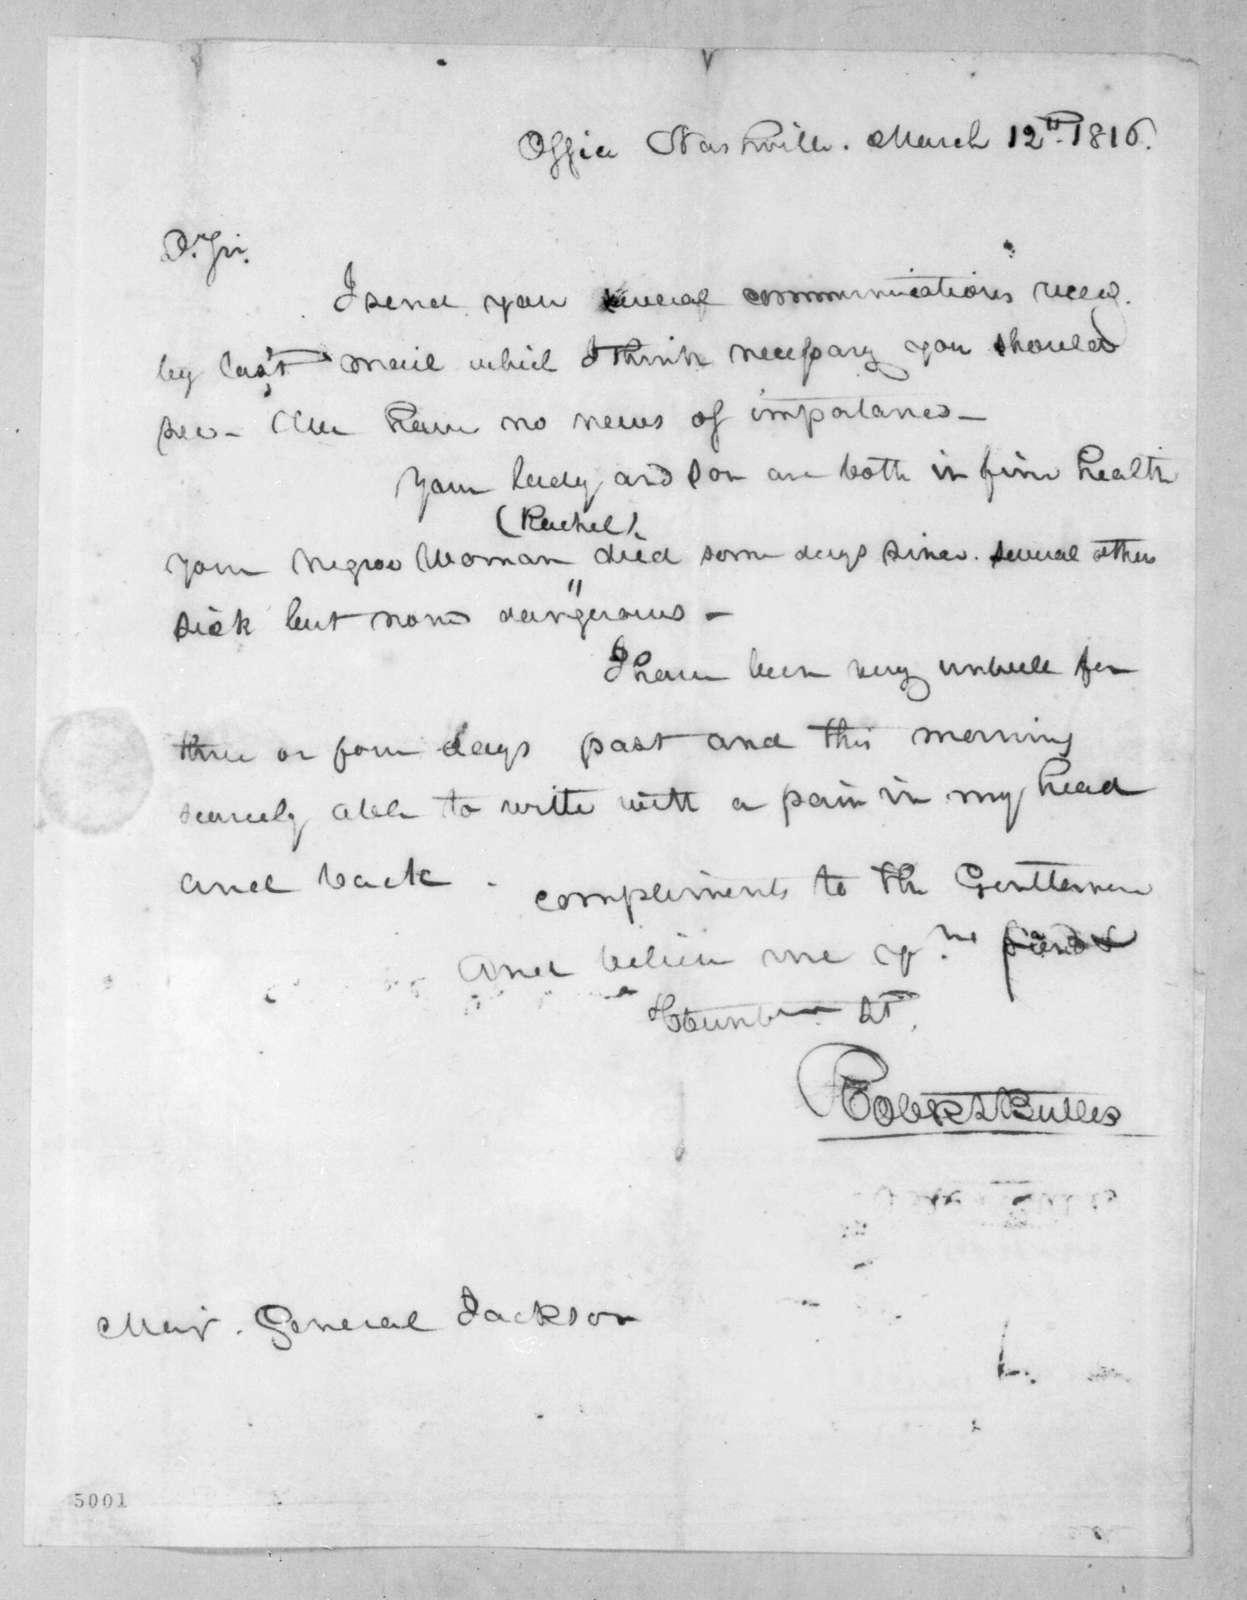 Robert Butler to Andrew Jackson, March 12, 1816